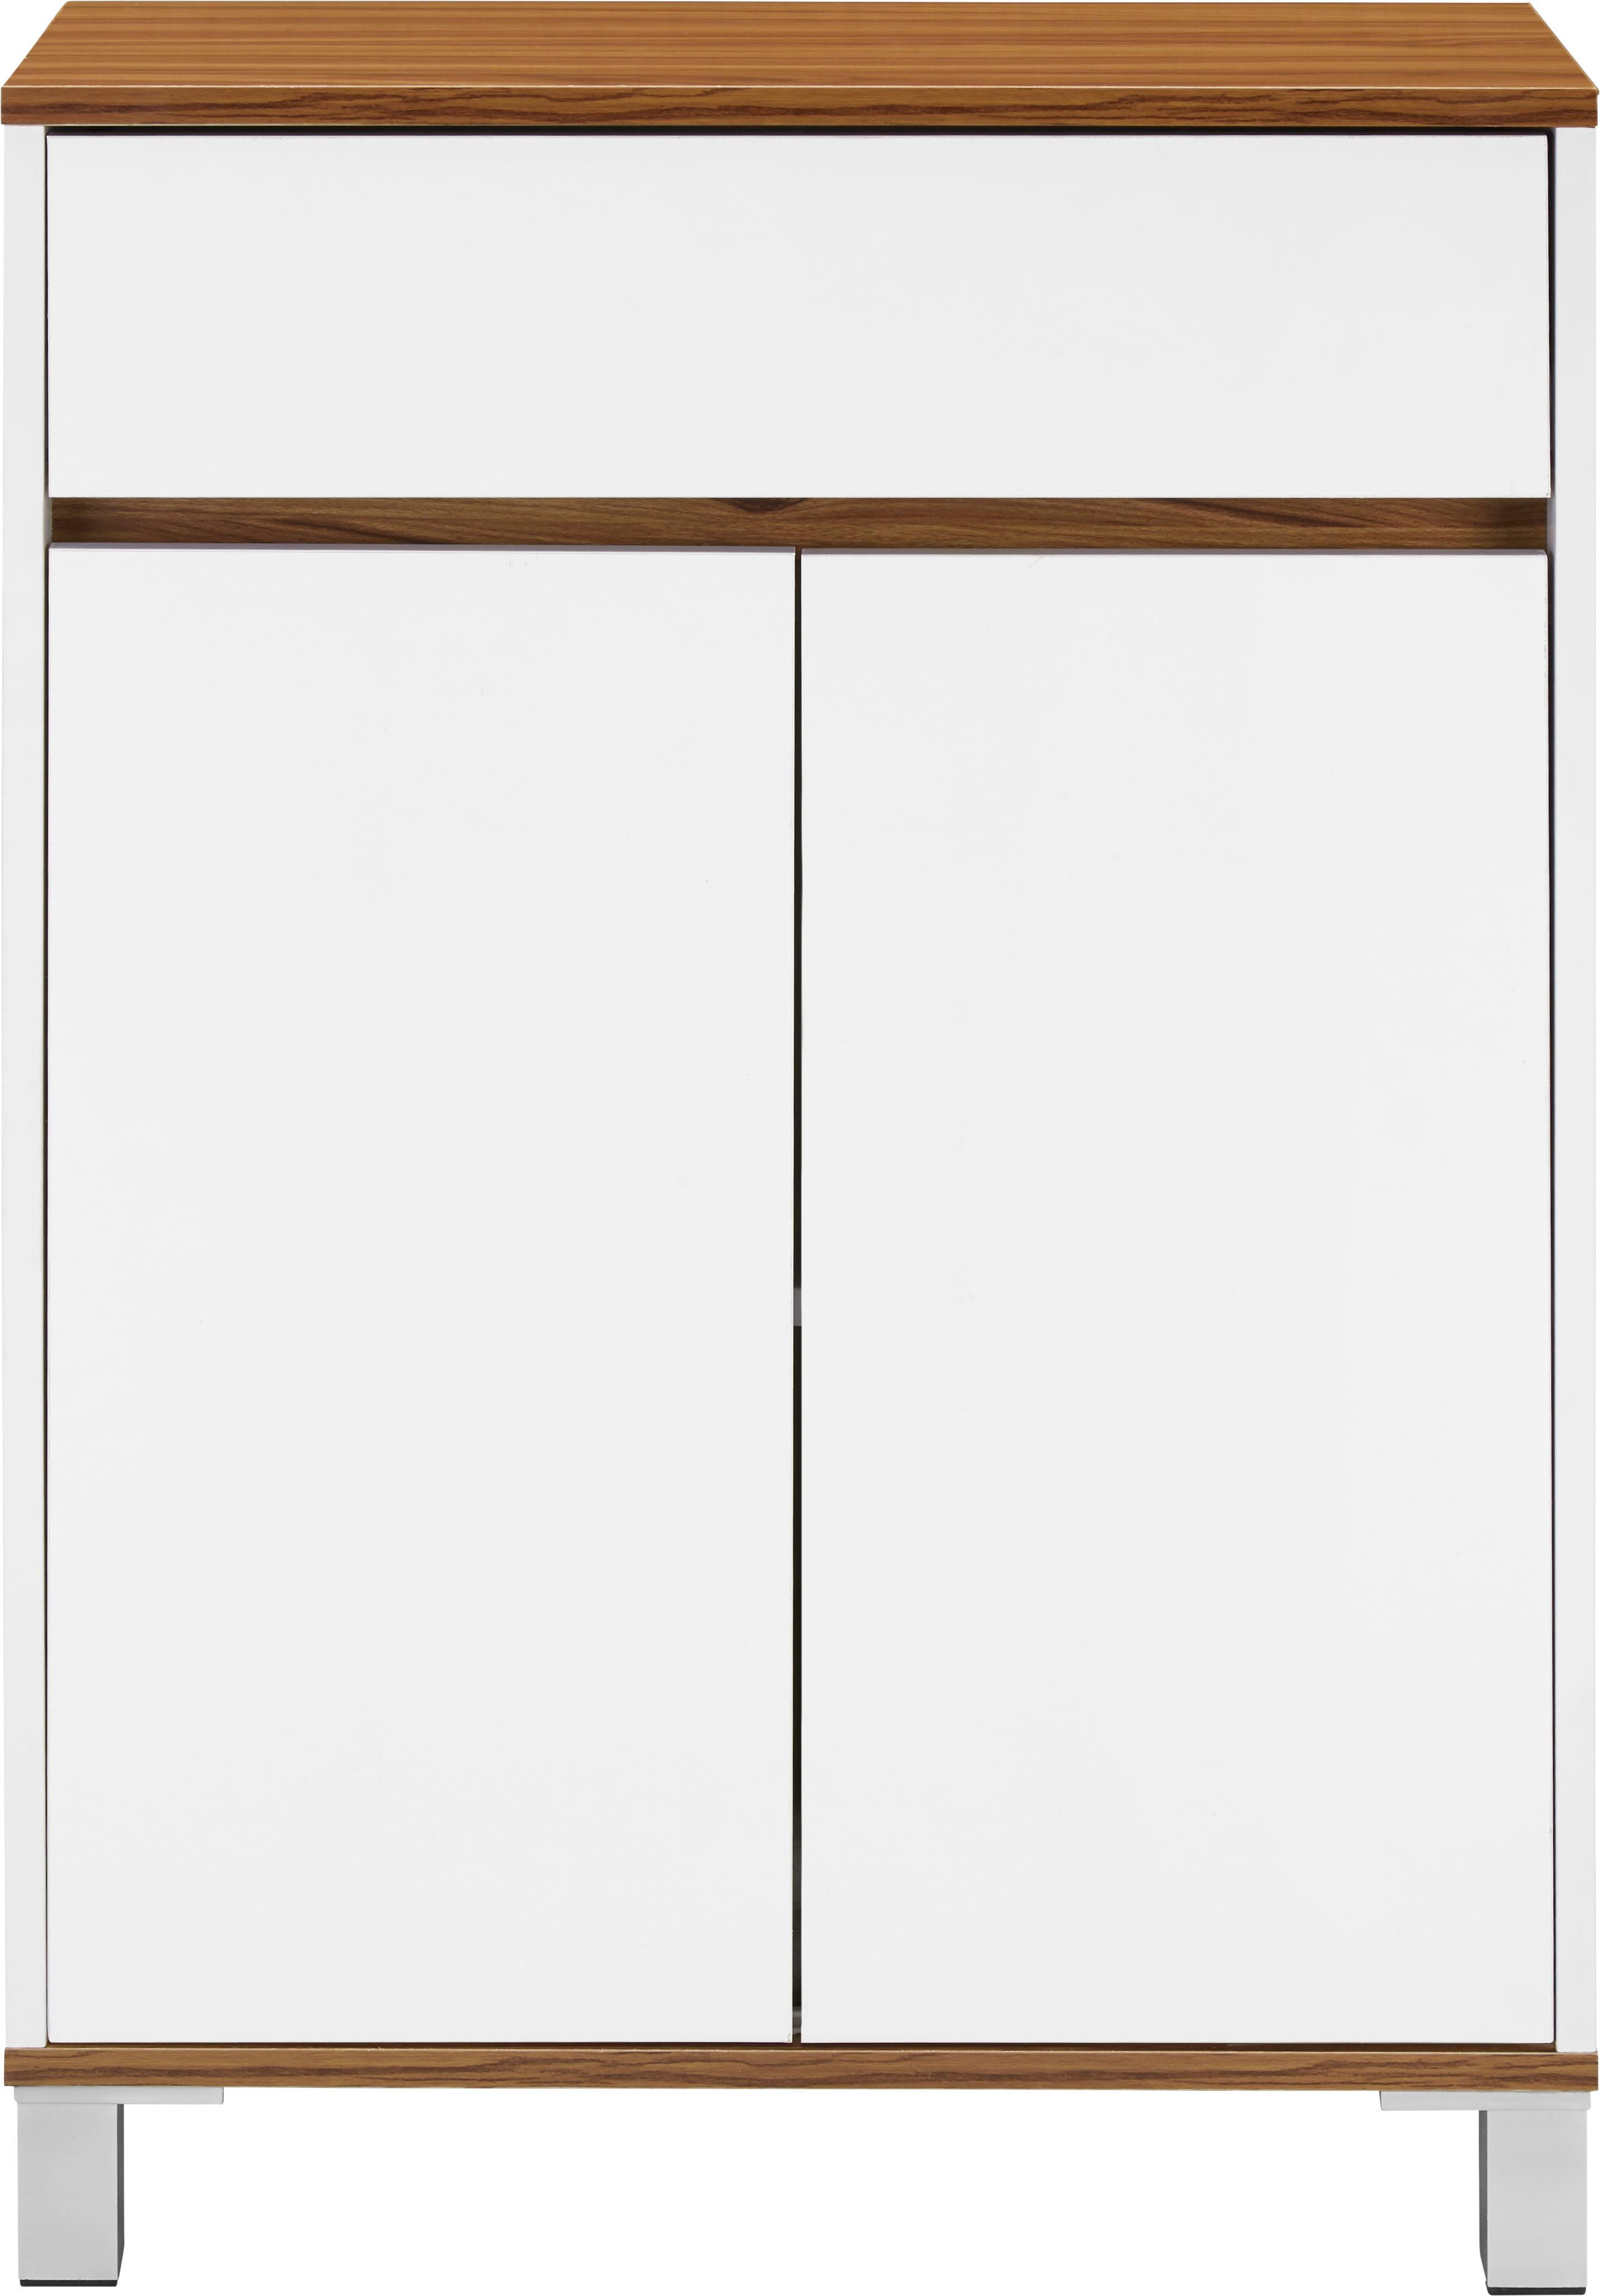 Unterschrank Franca - Braun/Weiß, MODERN, Holz (60/86/30cm) - MÖMAX modern living